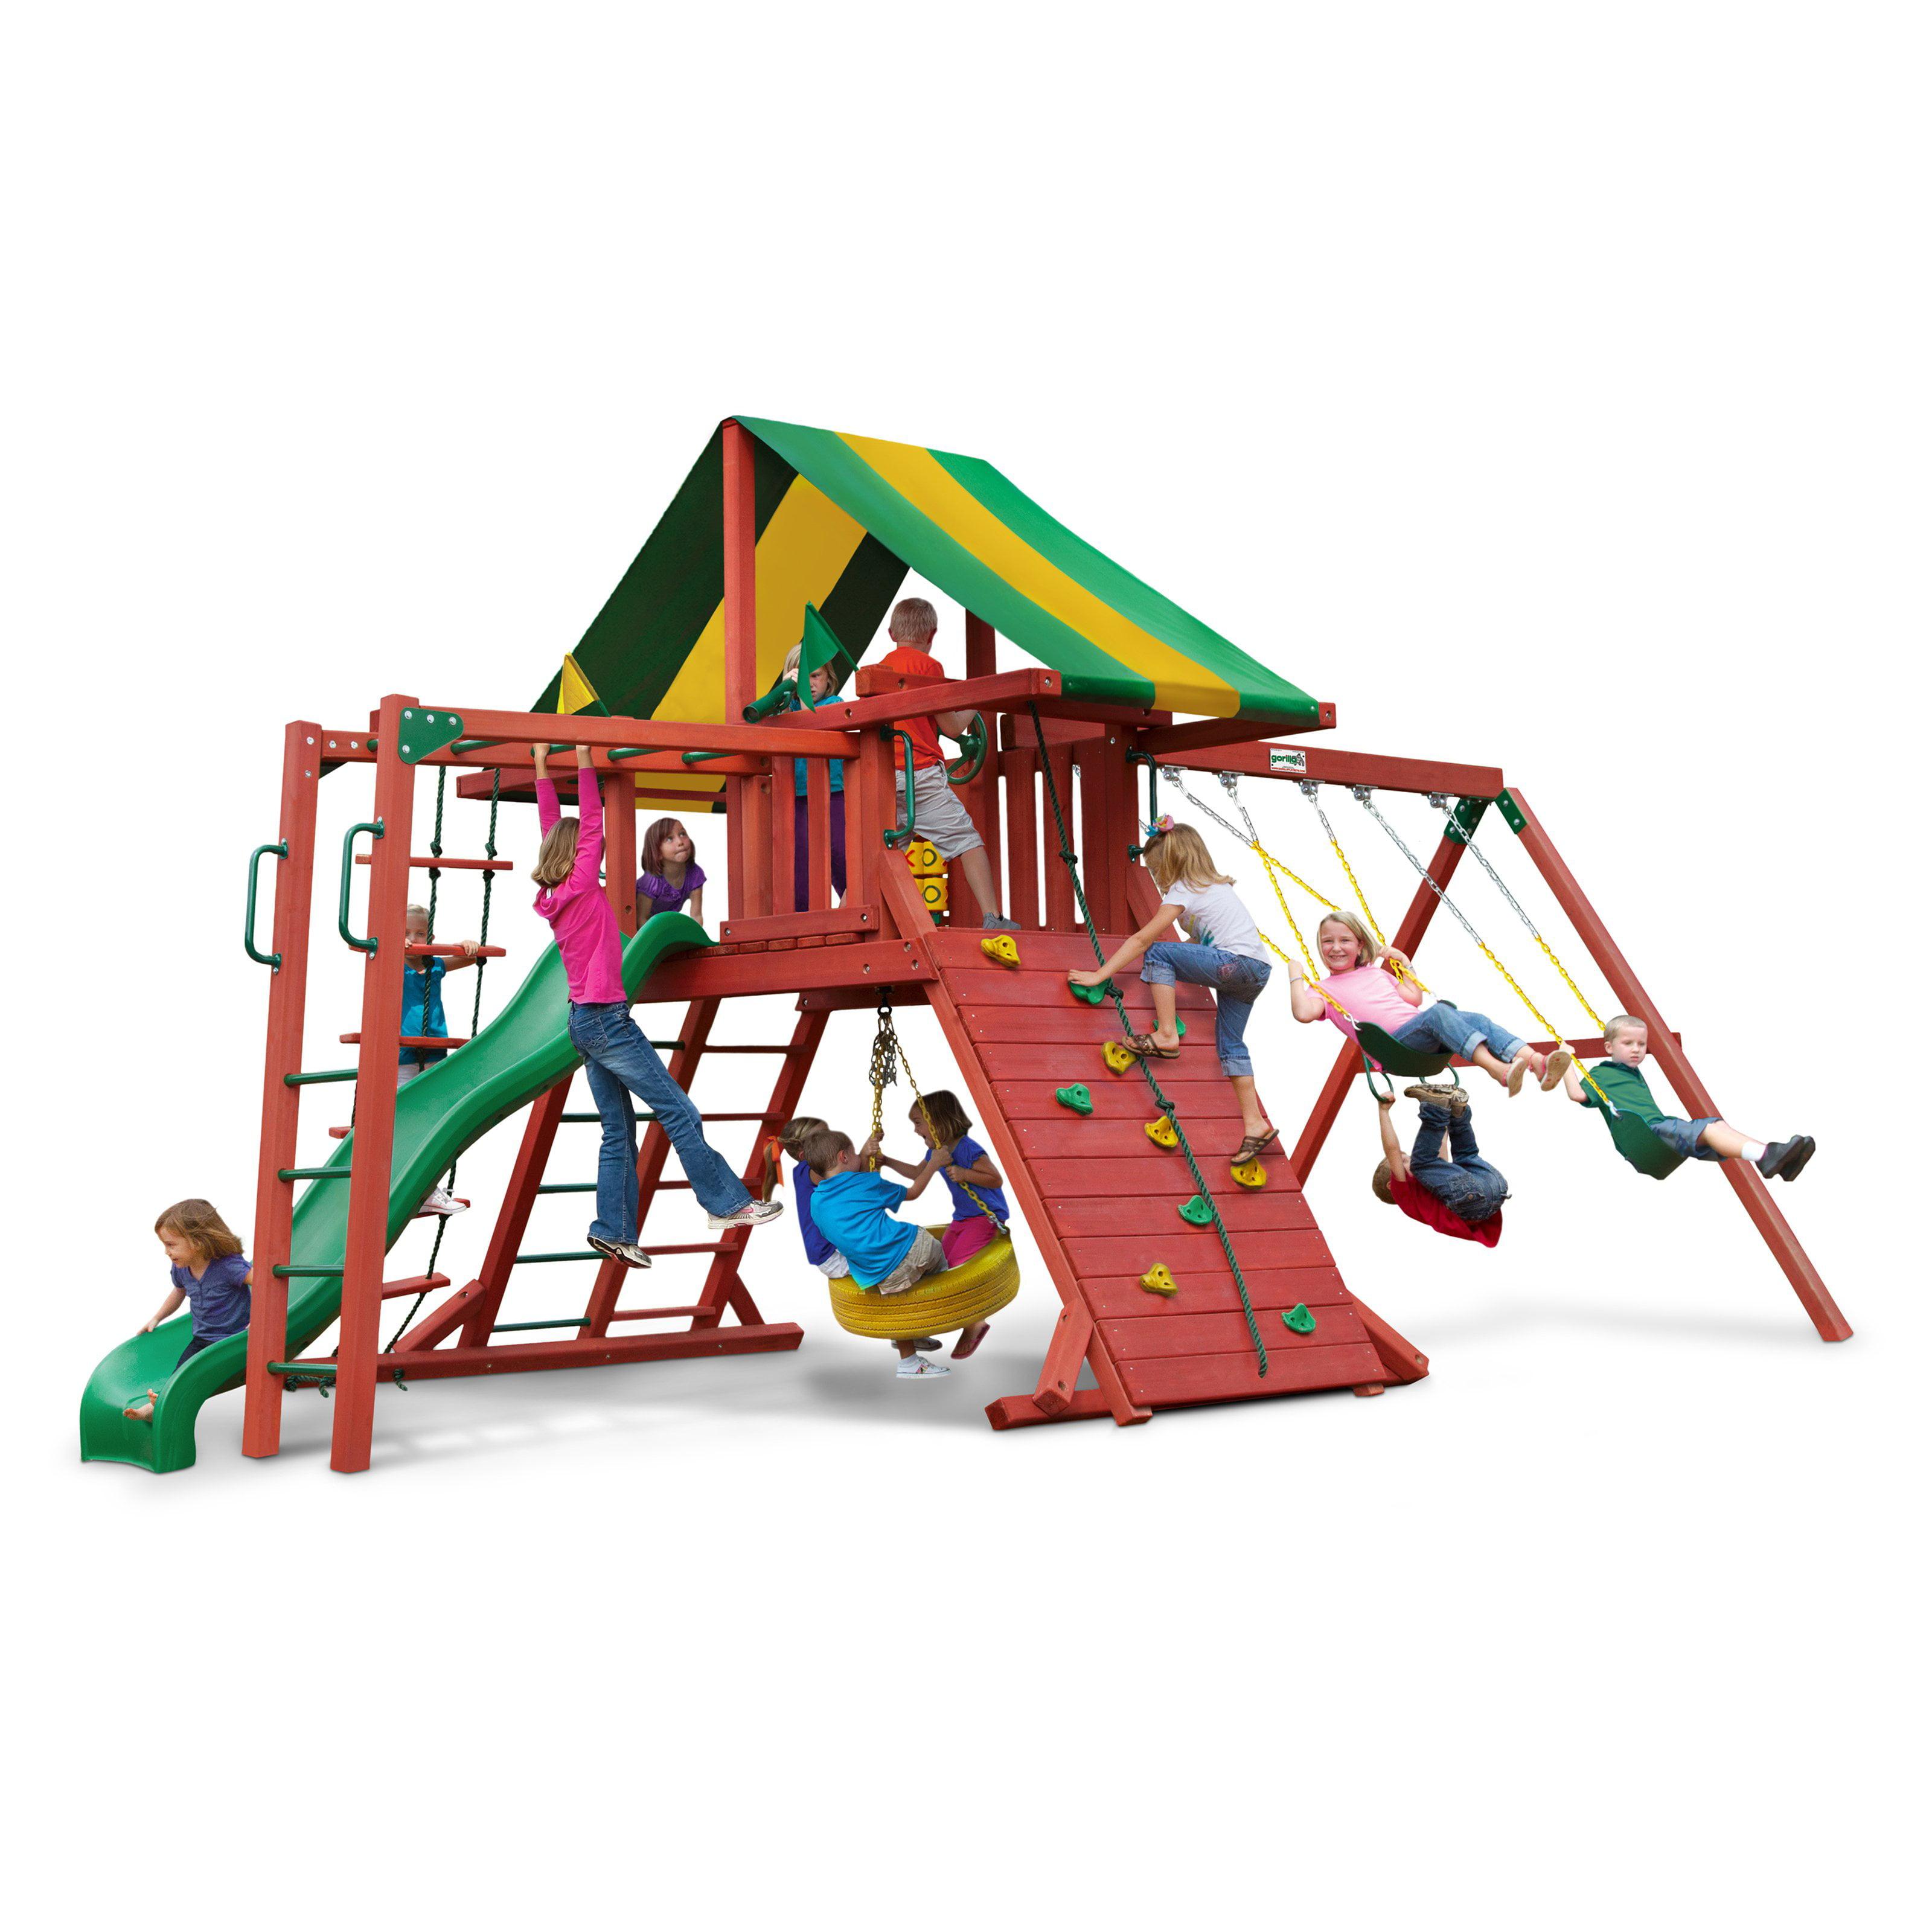 Gorilla Playsets Sun Valley II Cedar Swng Set by Overstock